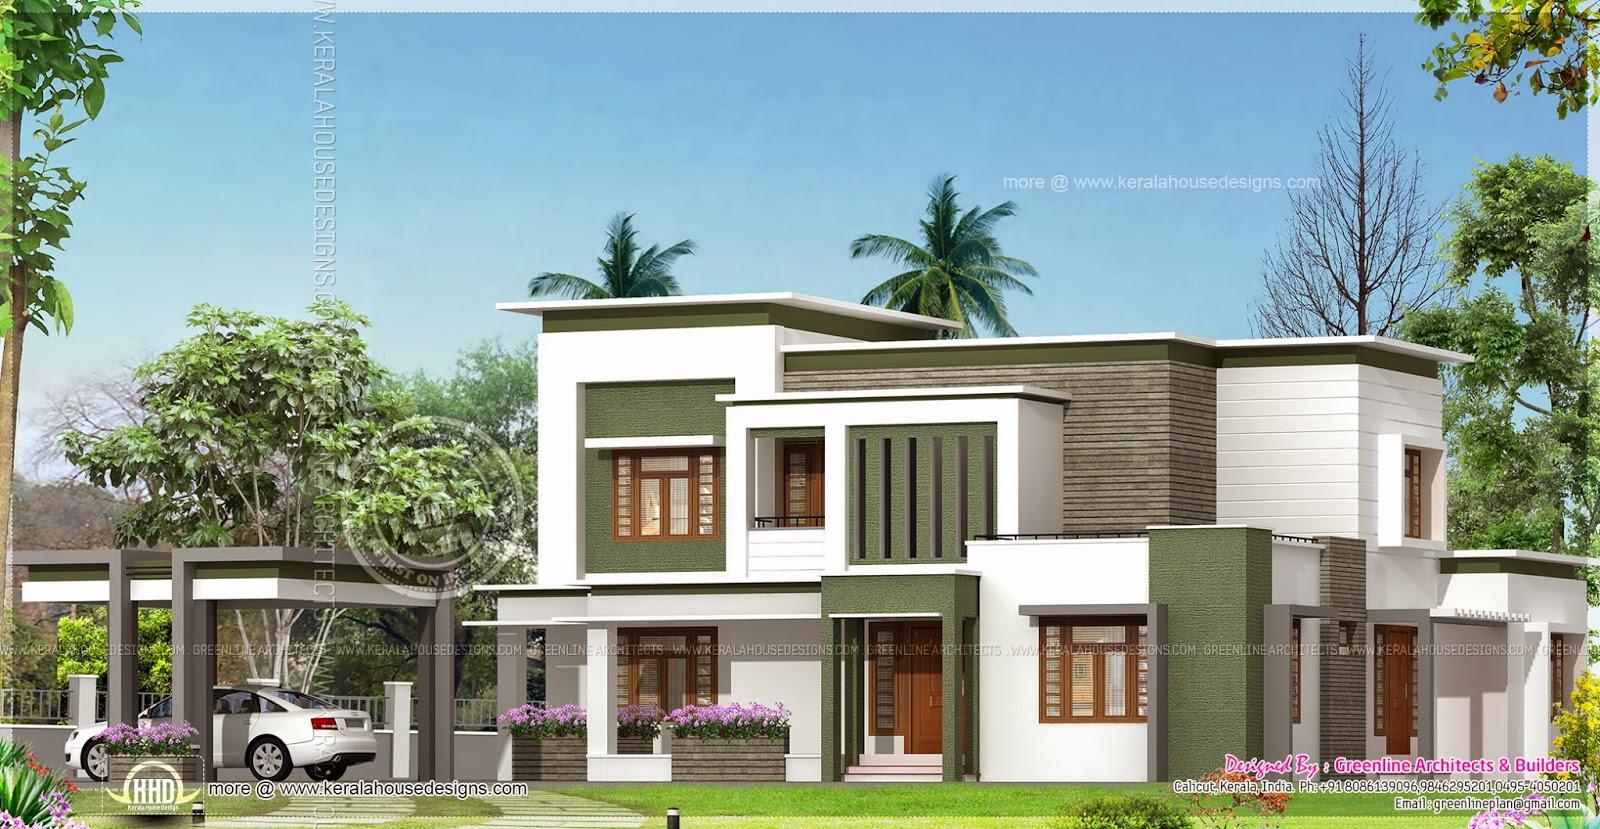 Kerala home design - വീട് ഡിസൈന്,പ്ലാനുകള് on schultz home designs, casino home designs, perry home designs, frontier home designs, hogan home designs, bearden home designs, rosenthal home designs, old fashioned home designs, sater home designs, lake view home designs, fine home designs, ryan home designs, wright home designs, royal home designs, smith home designs, barber home designs,